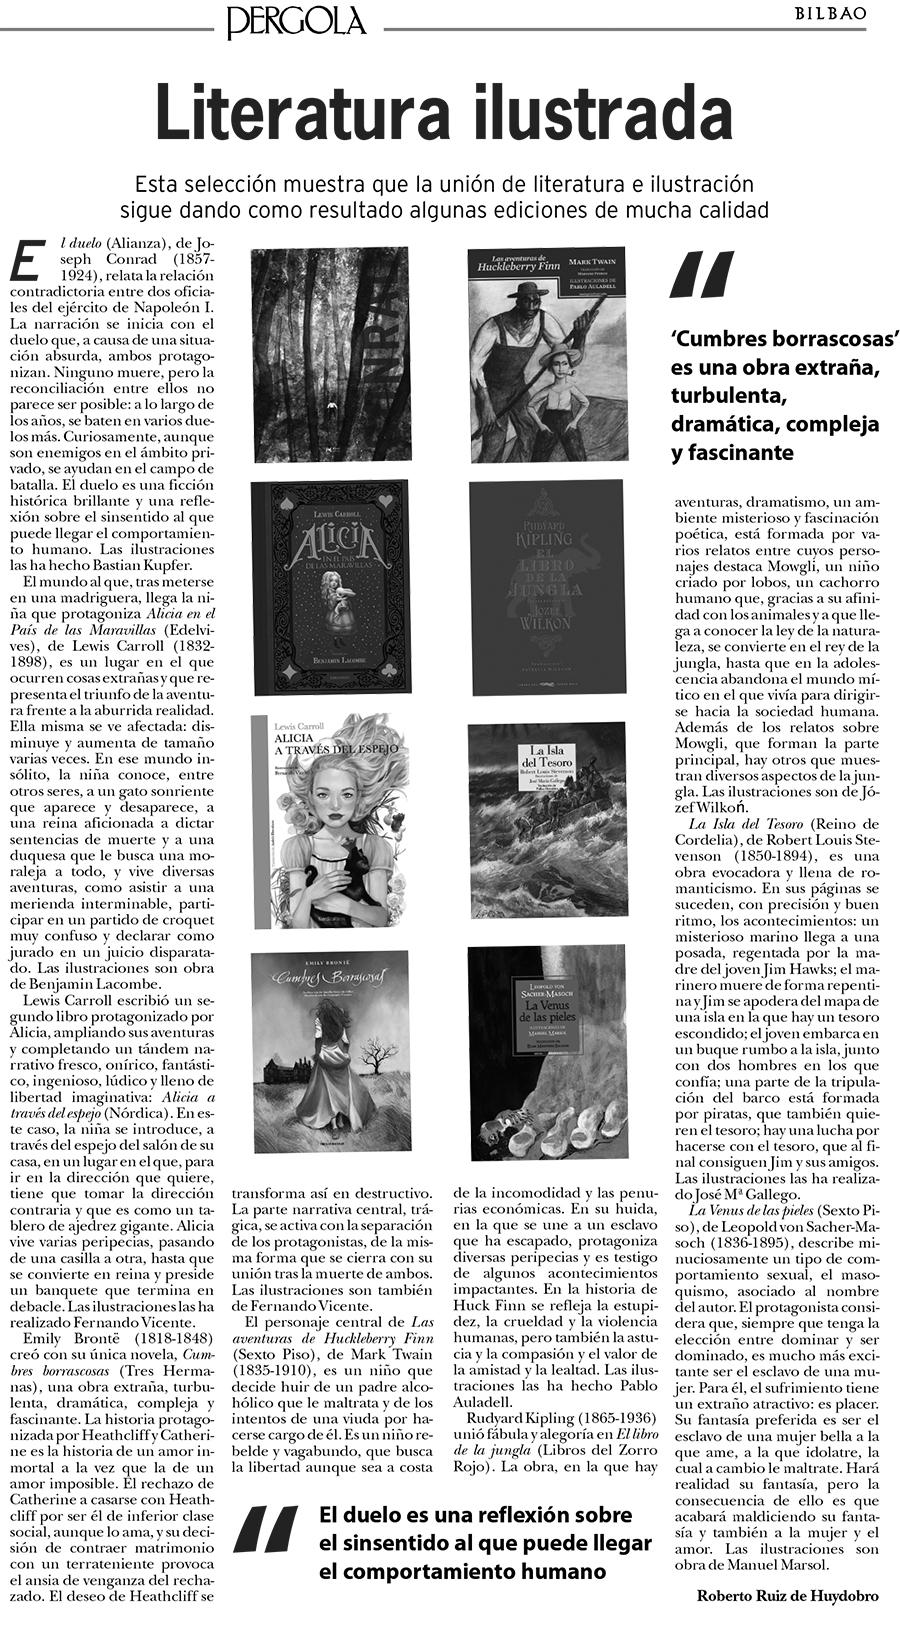 12/12/2016 Revista Pérgola